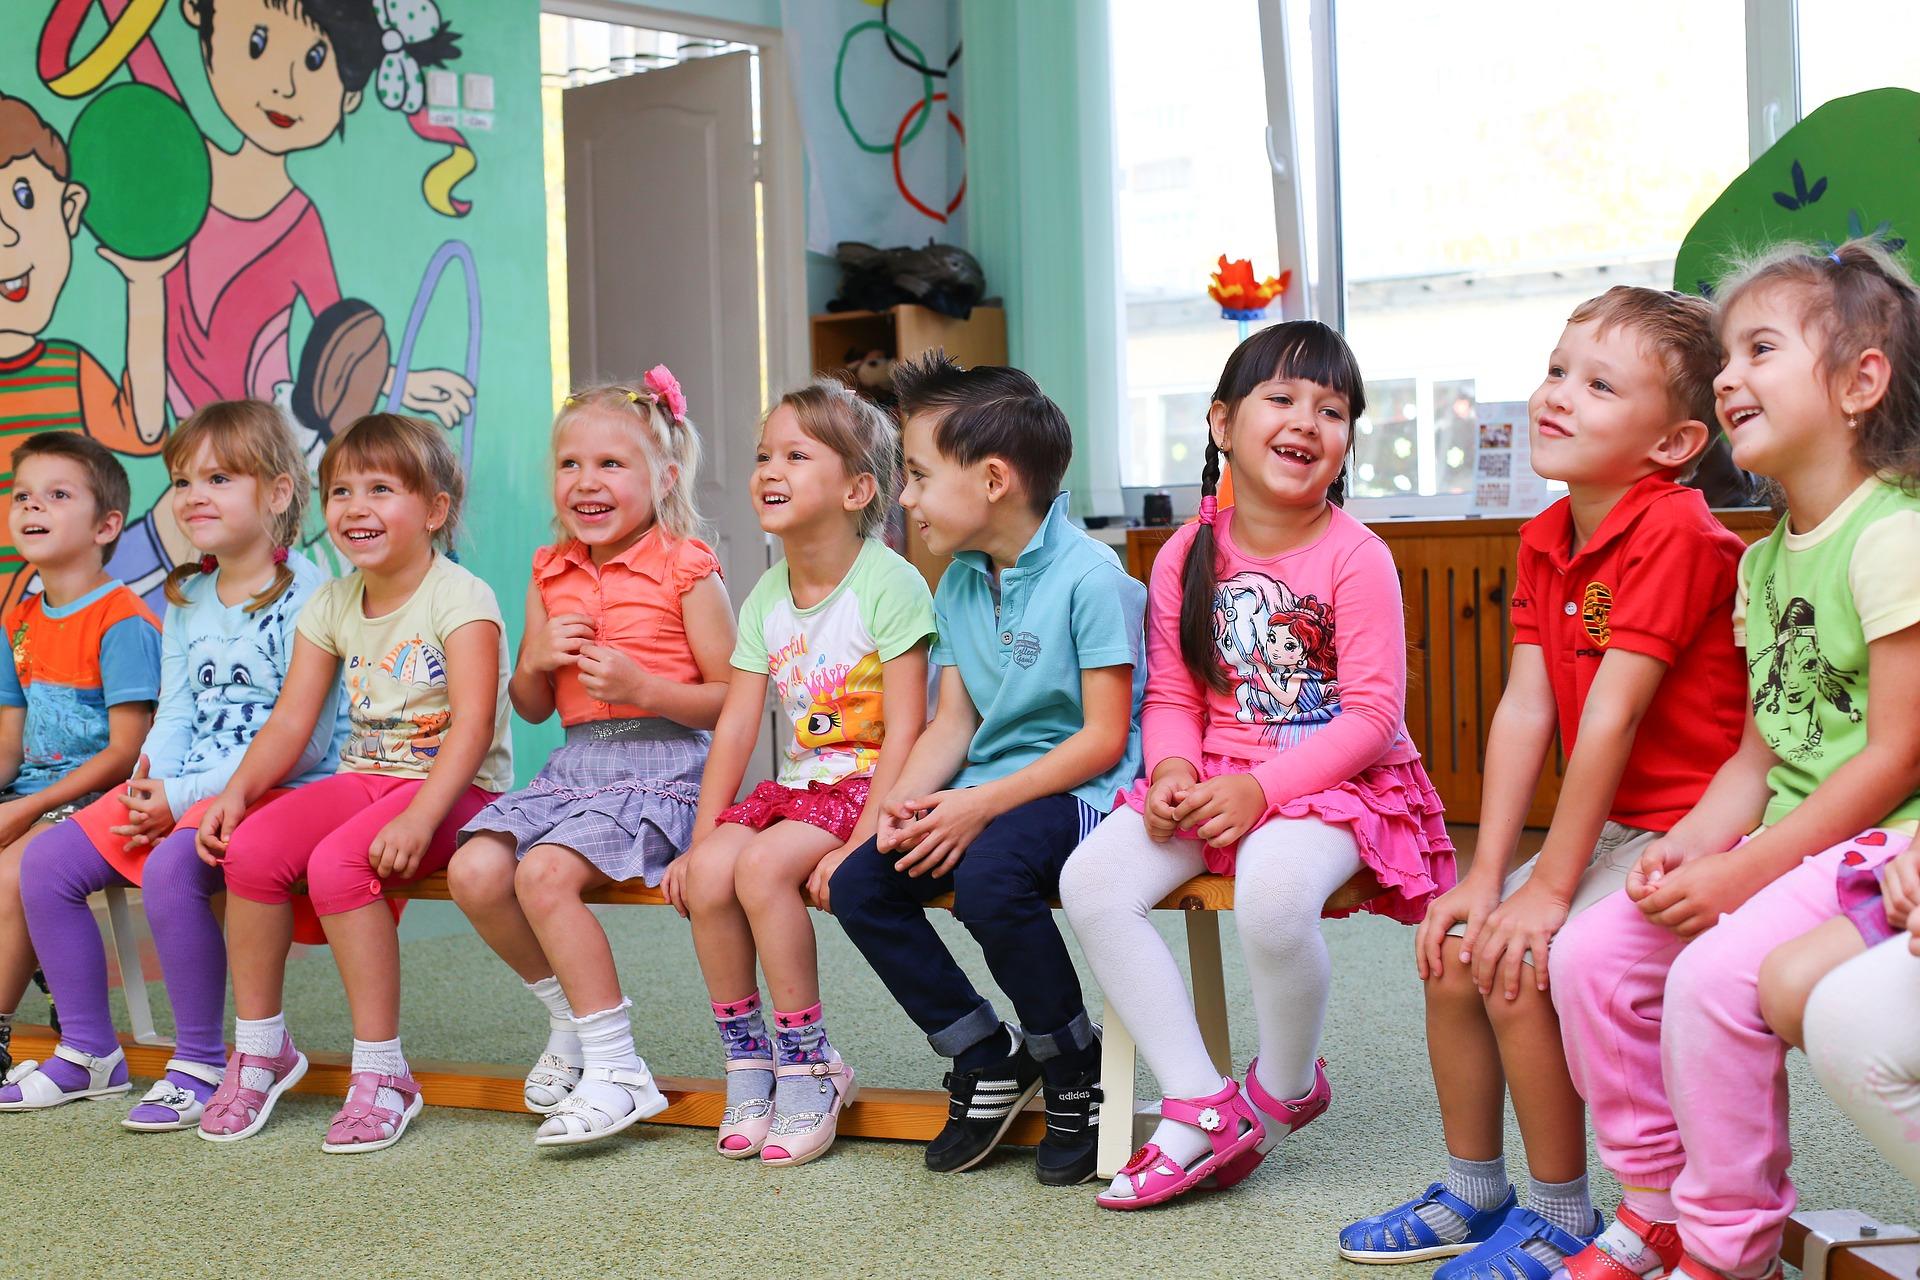 Bildungspolitik: Drohen an unseren Schulen Berliner Verhältnisse? (Landtagswahl 2018)